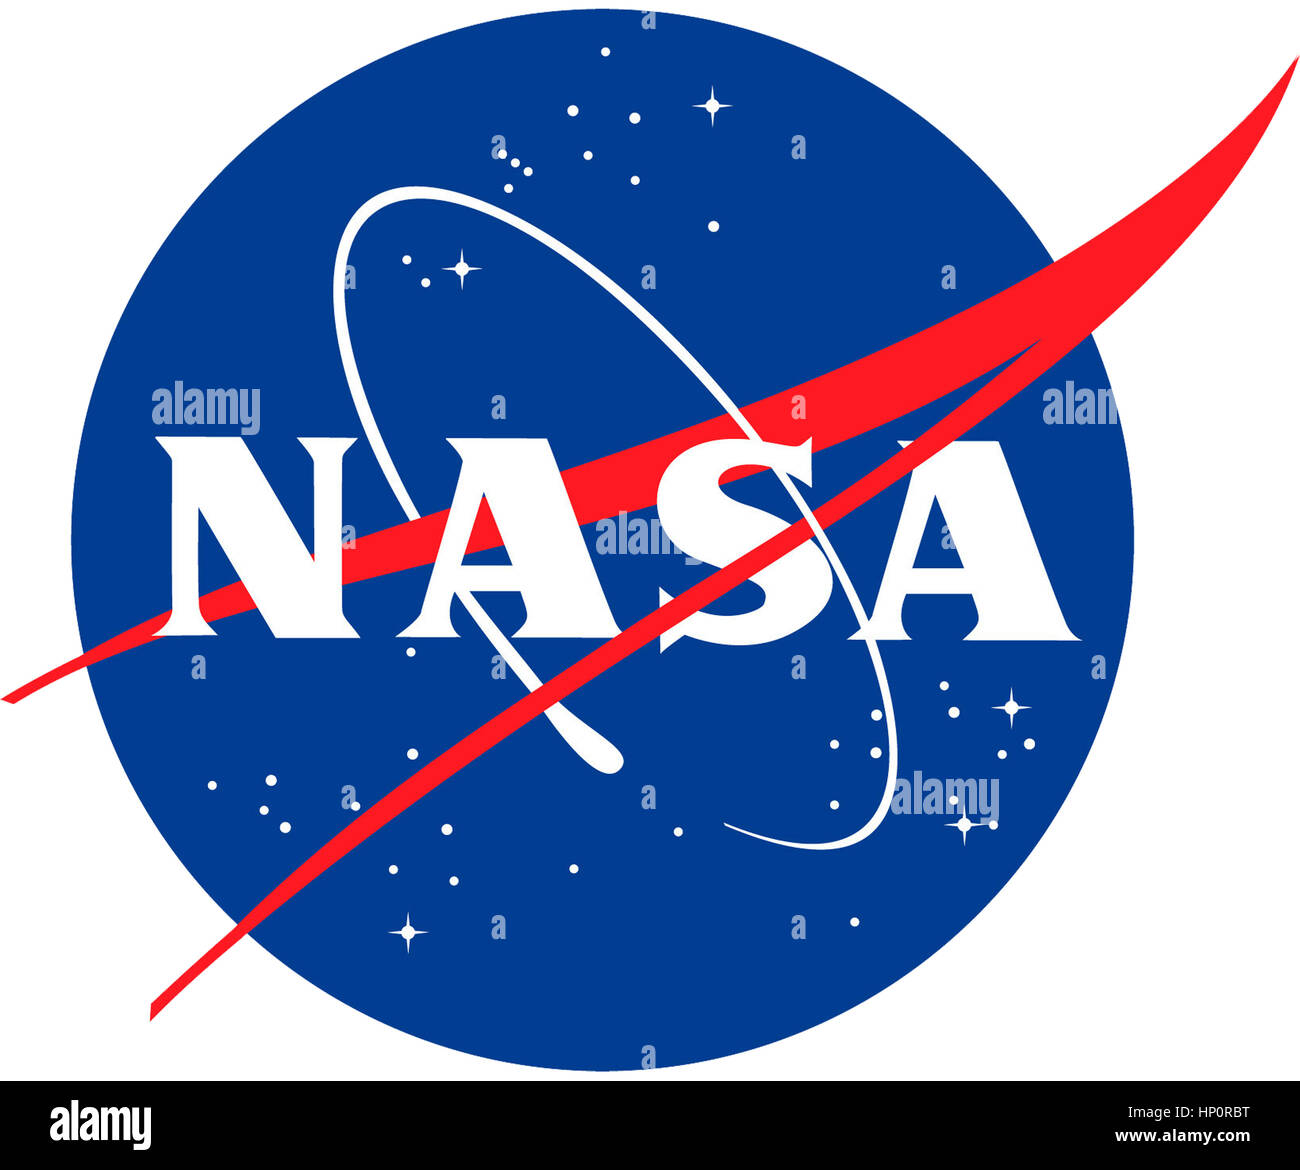 NASA Logo - Stock Image